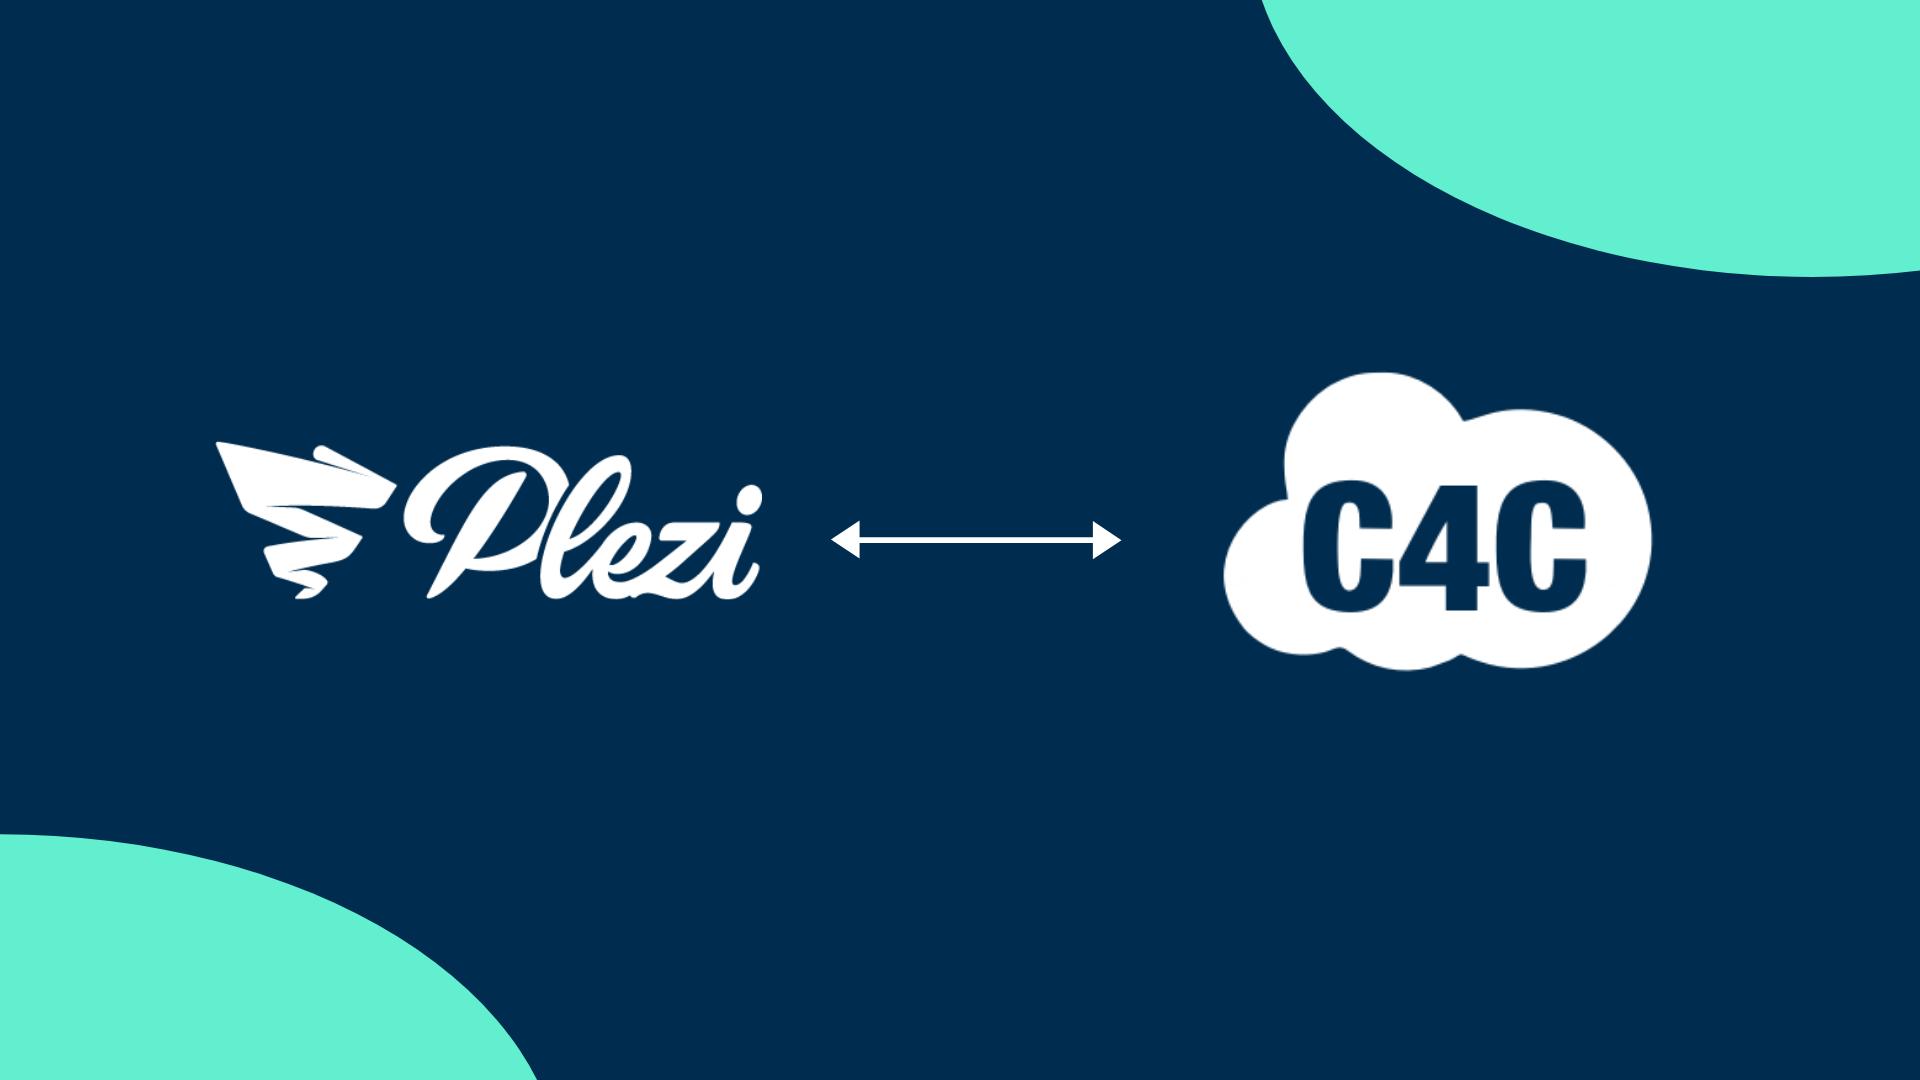 integration c4c Plezi